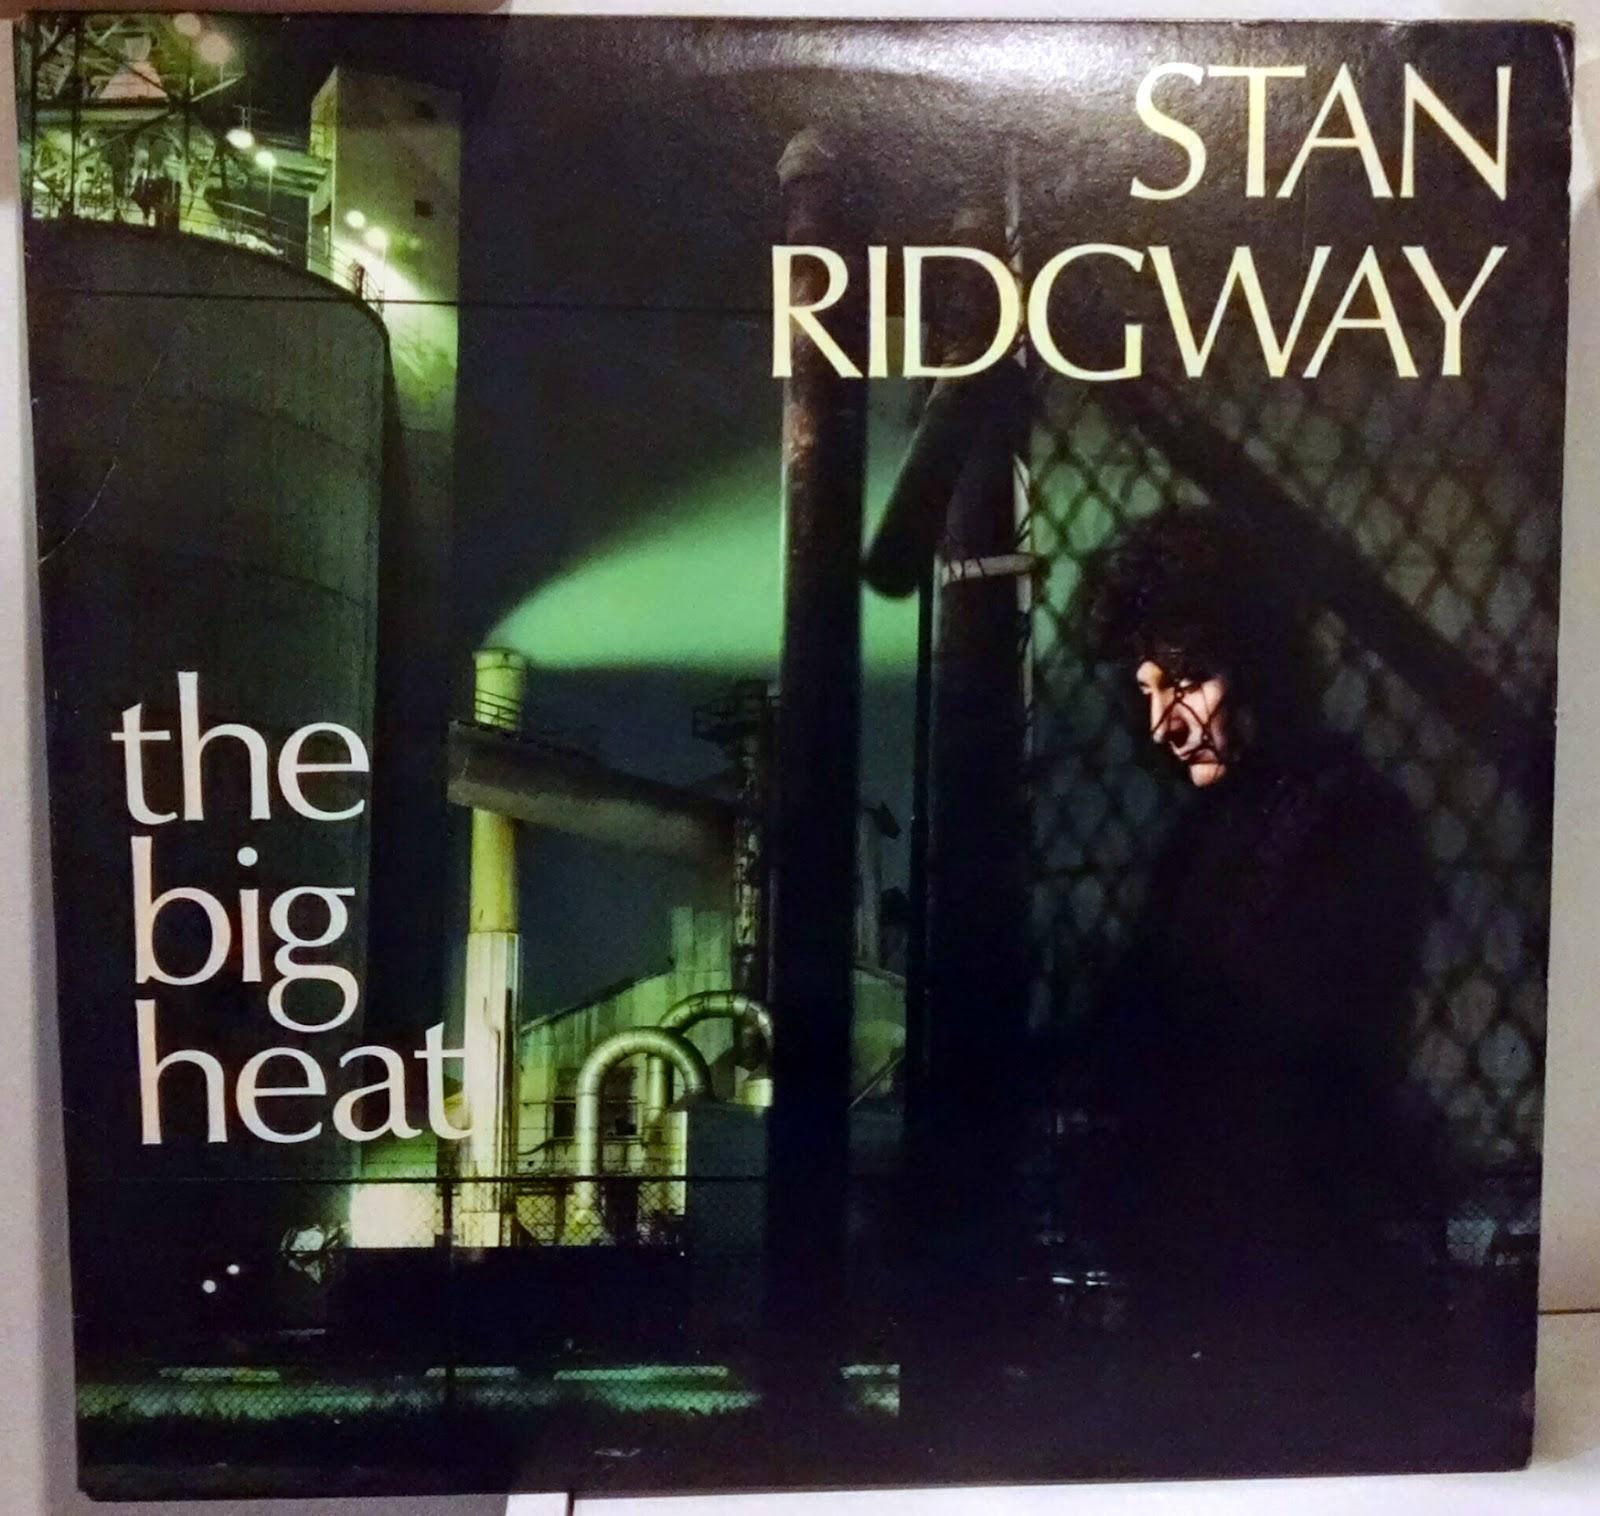 Life at 33 1/3 : big heat, the (1986) - stan ridgway: irs